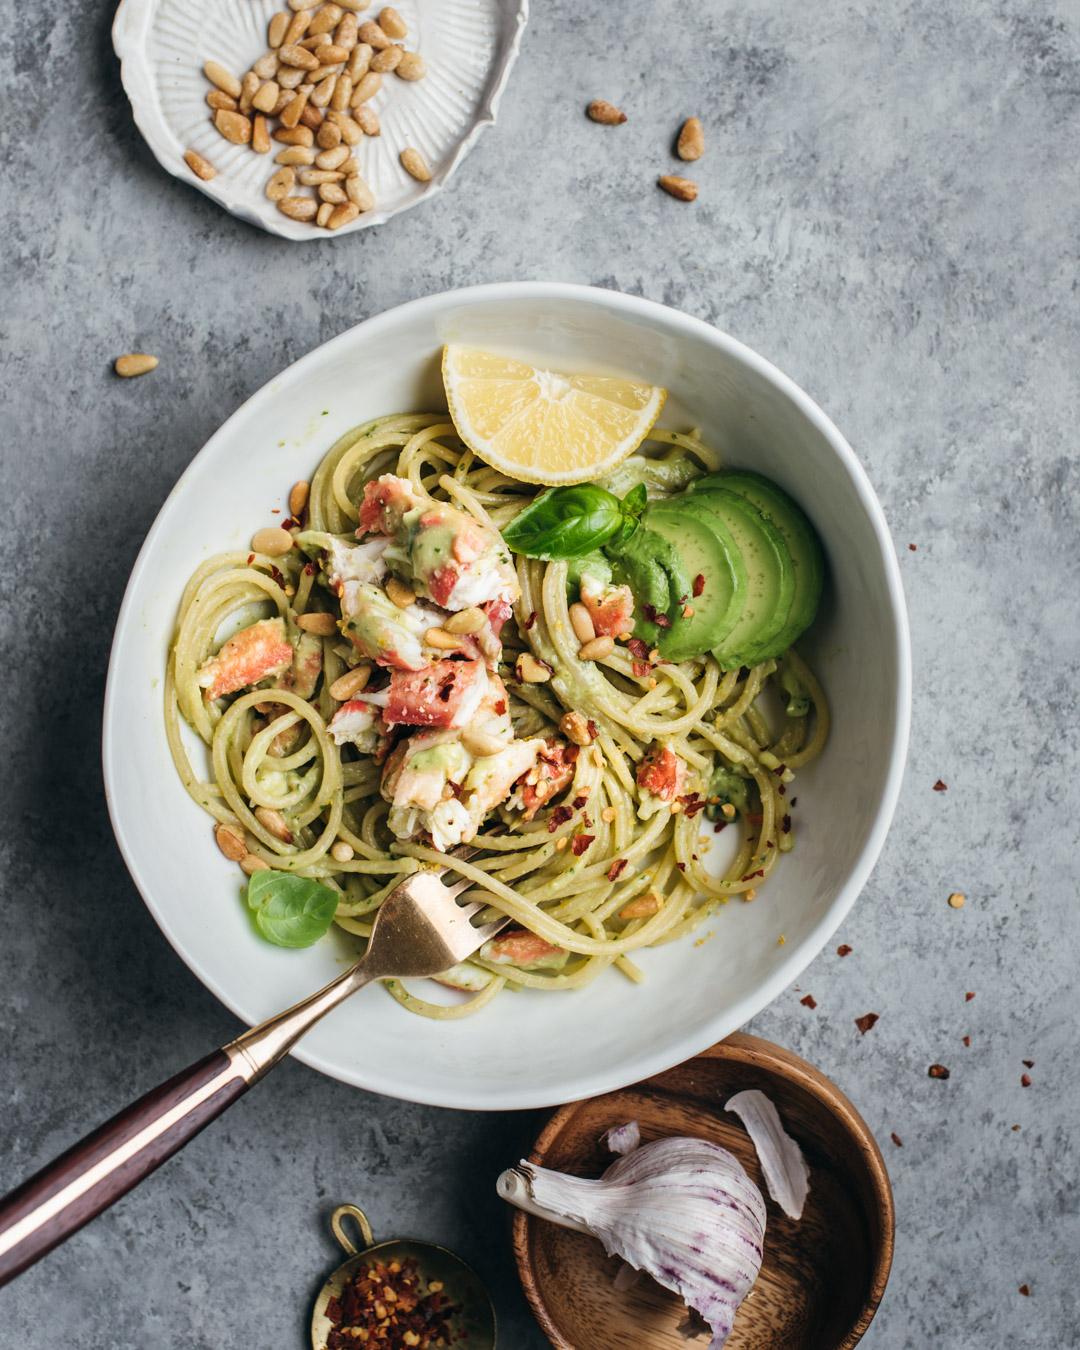 king crab avocado pesto pasta petrossian-9924-2.jpg